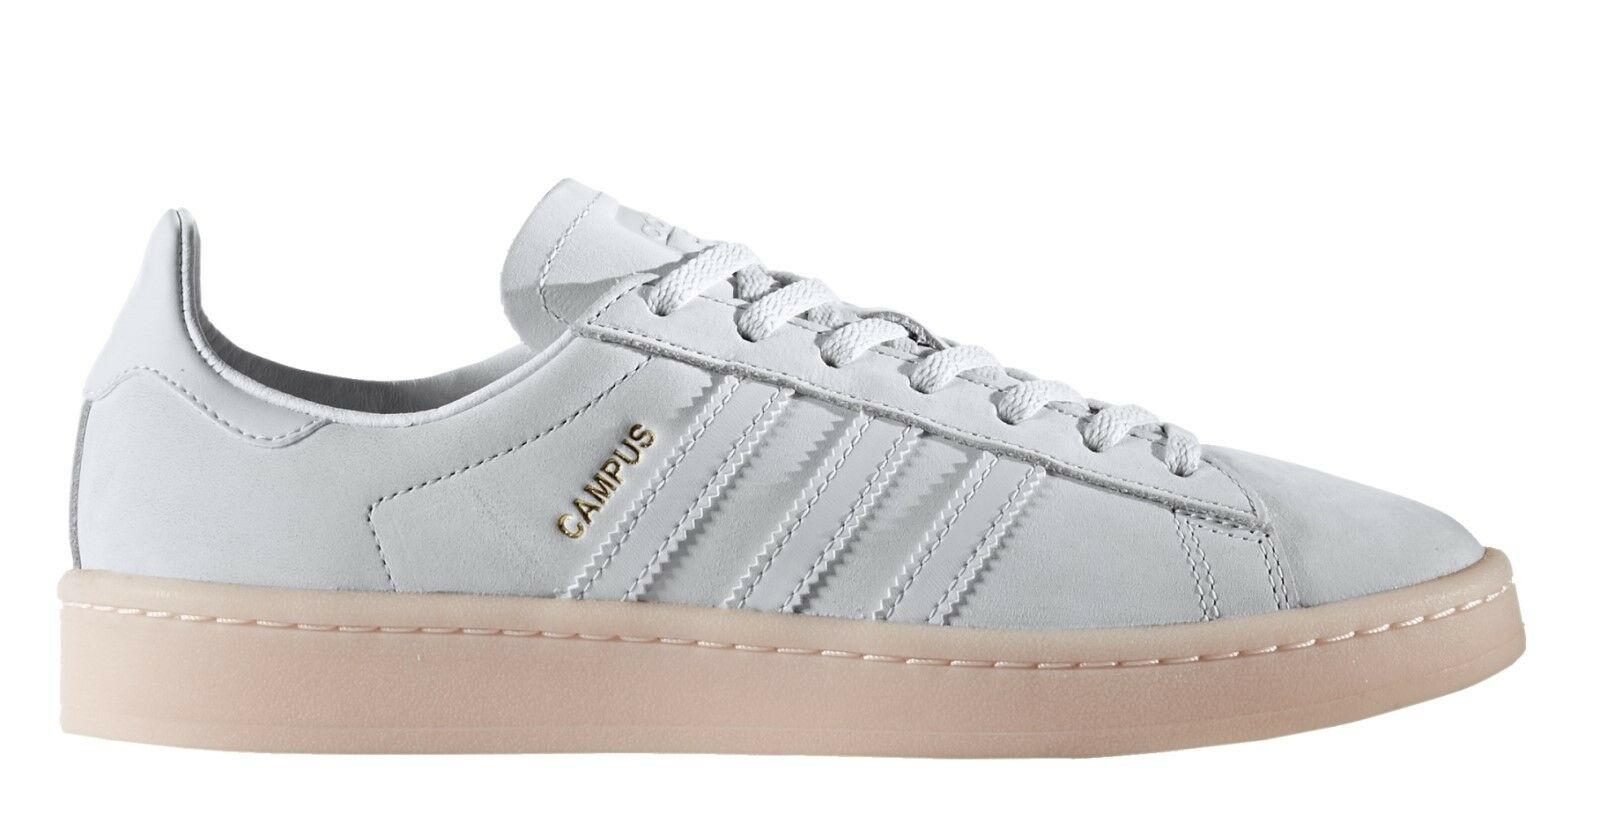 Adidas Frauen Originals Campus Schuh BY9839 Echtleder Originals Damenschuhe NEU NEU NEU 480e72